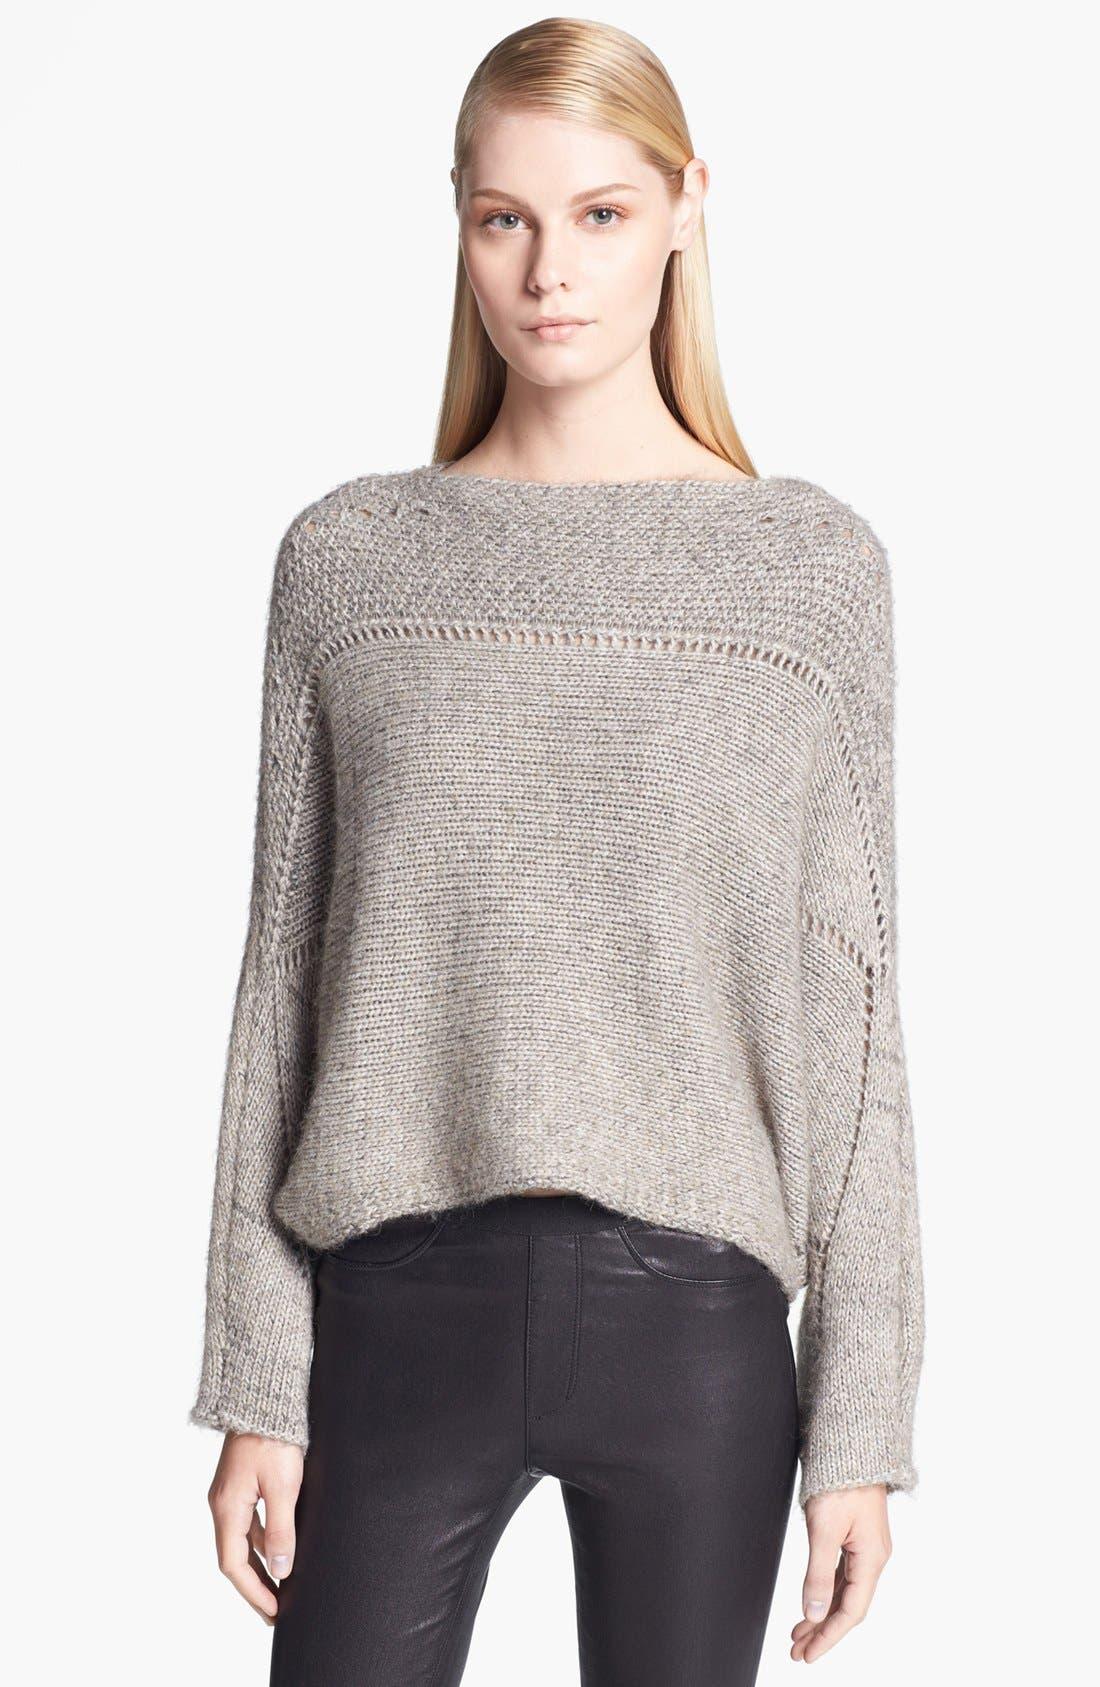 Alternate Image 1 Selected - Helmut Lang Novelty Knit Poncho Sweater